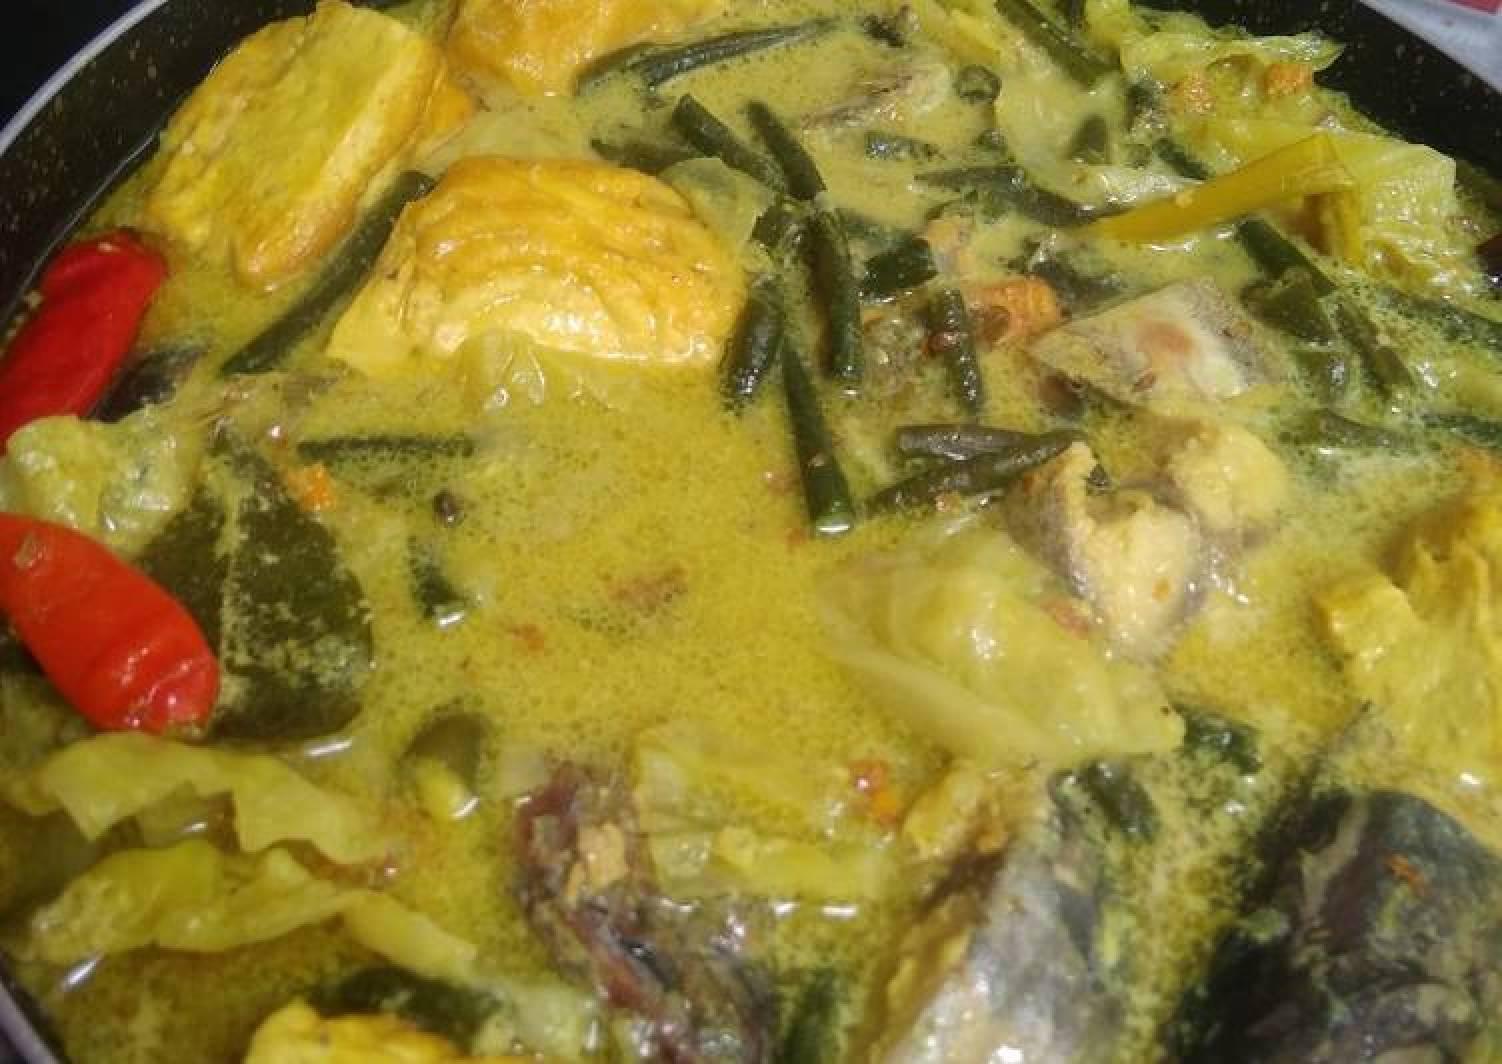 Resep Gulai Tongkol Tahu Kol Kacang Panjang Yang Lezat Best Recipes